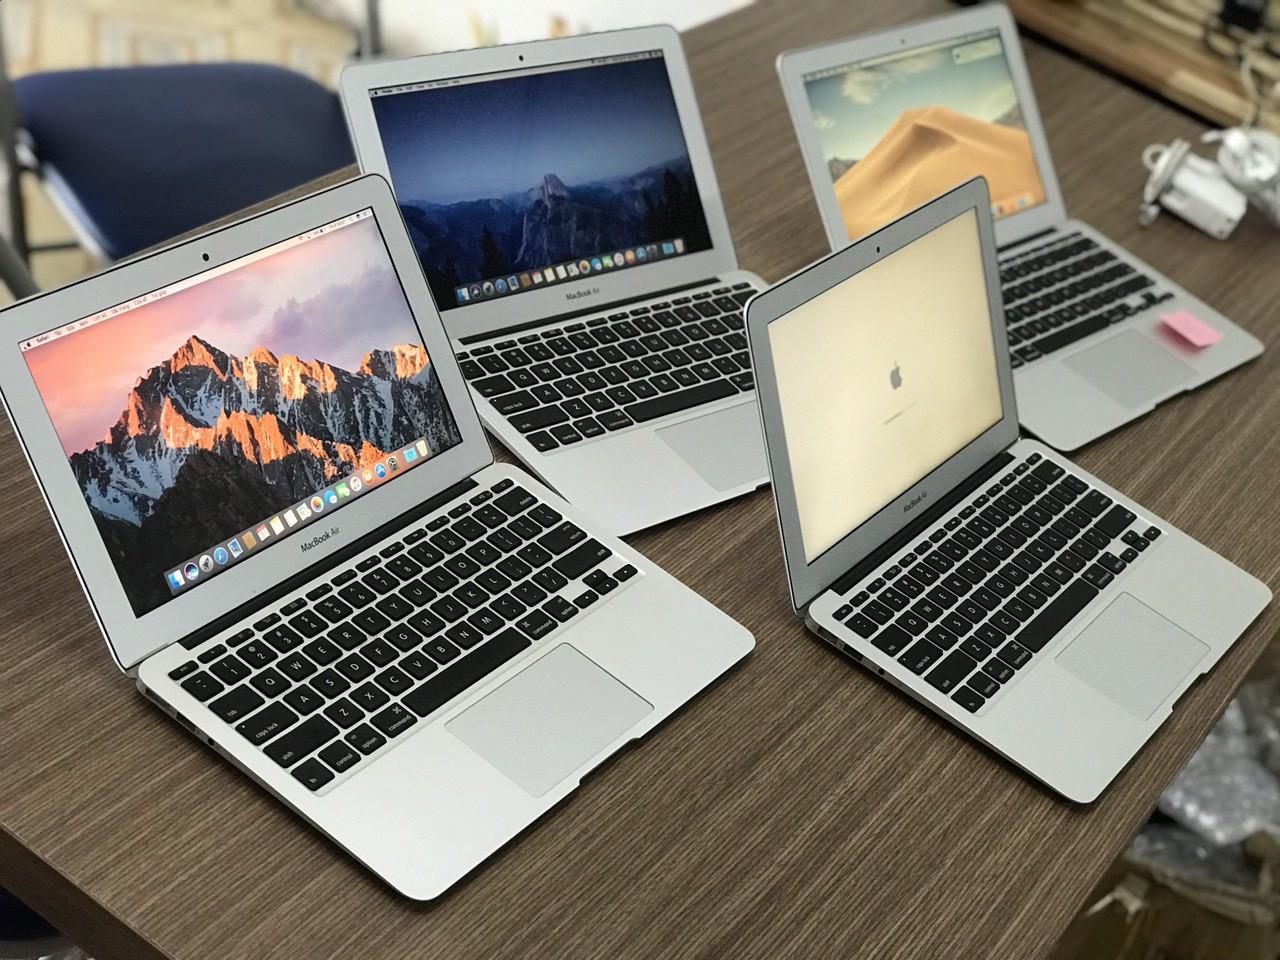 mua-laptop-cu-can-luu-y-dieu-gi-2